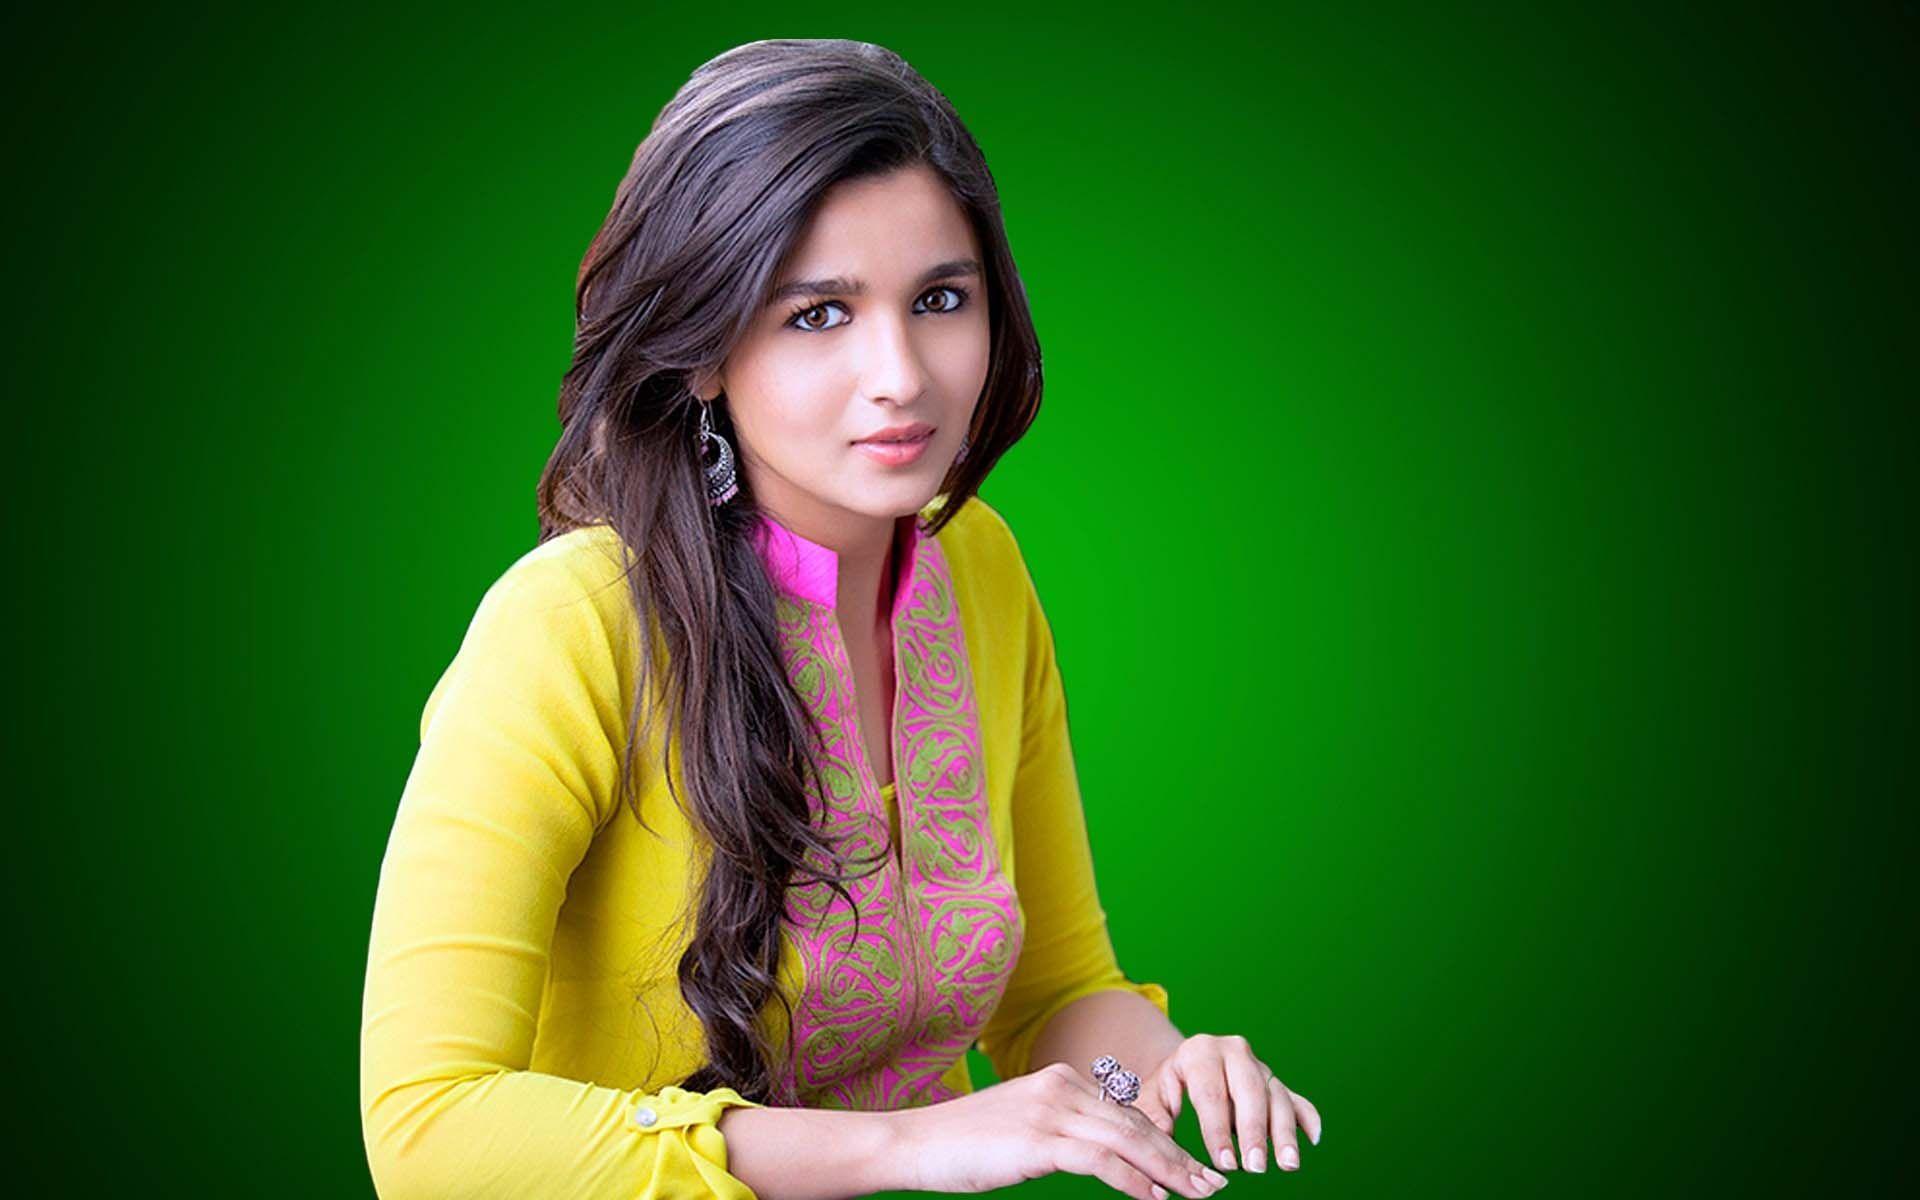 Alia Bhatt In Beautiful Dress Full Hd Wallpaper 1080p Actresses In